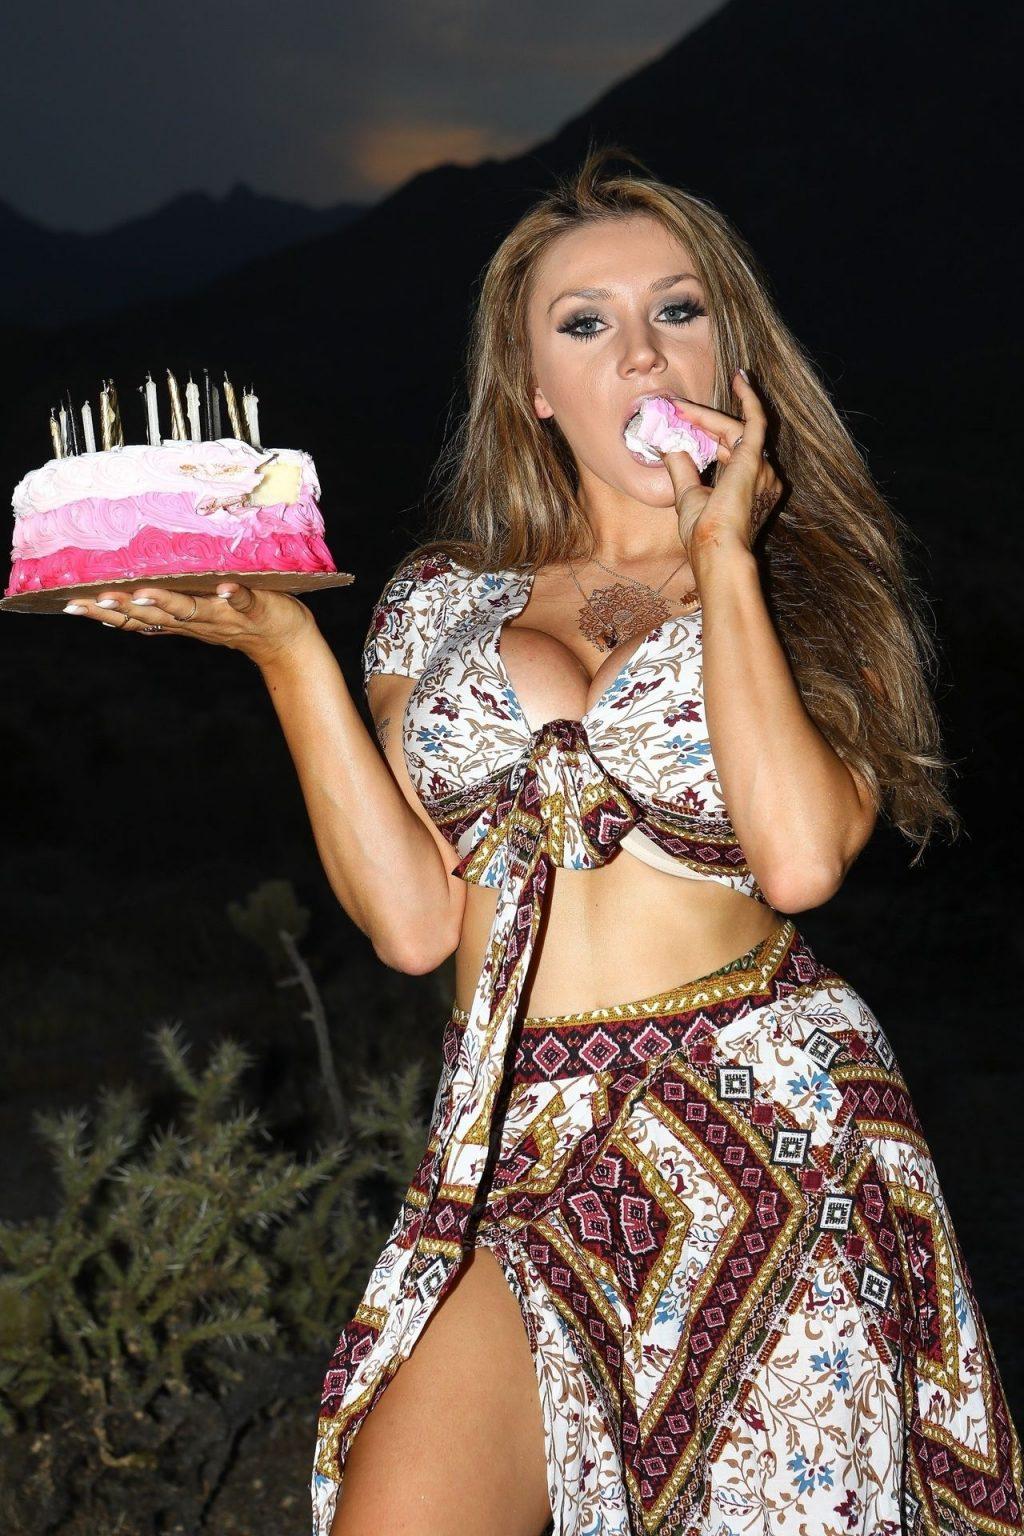 Courtney Stodden Celebrates Her Birthday in Palm Springs (60 Photos)